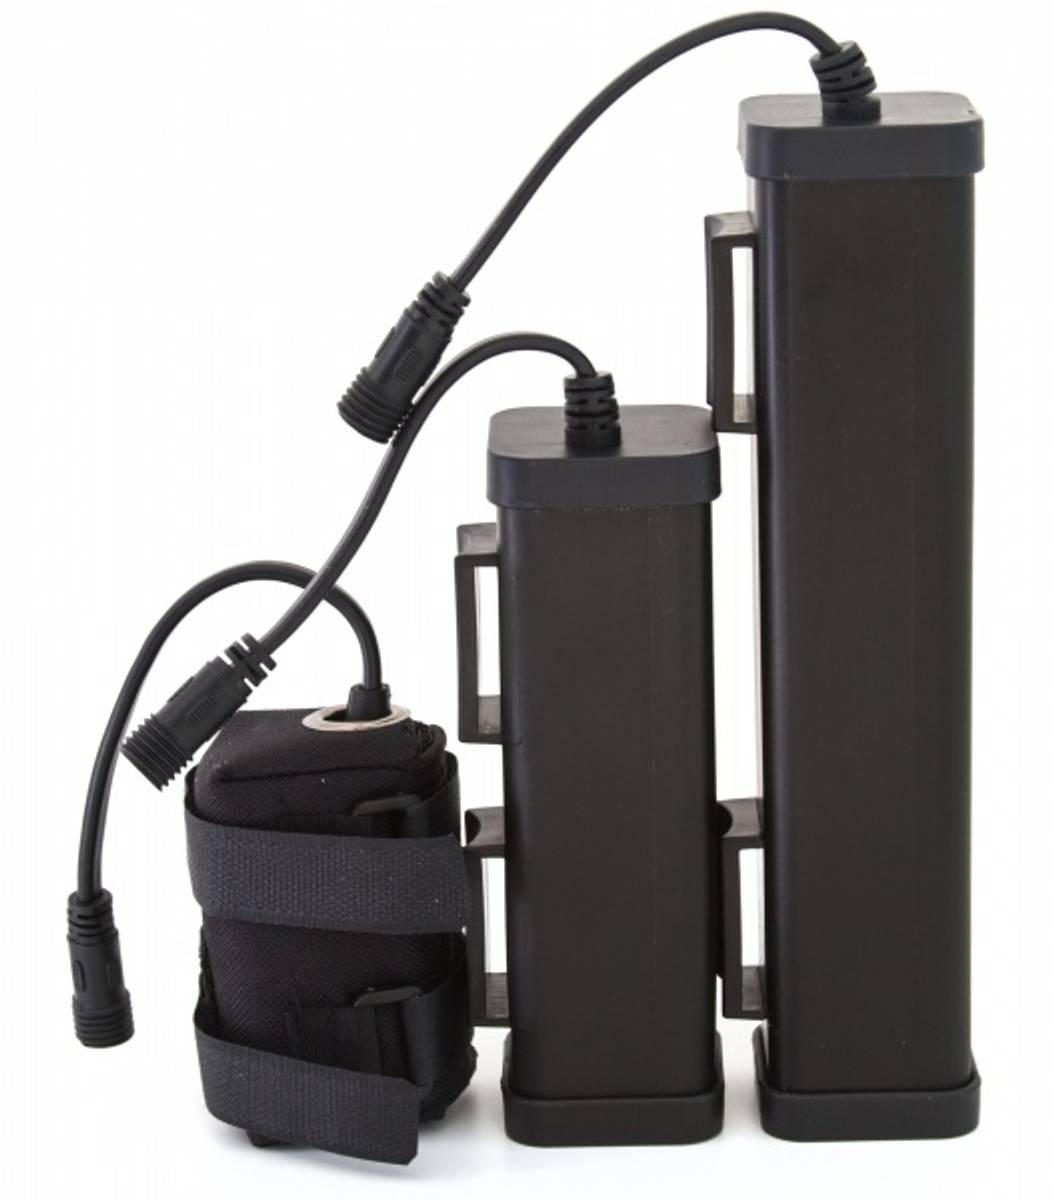 12 cellers batteri for 10000/12000